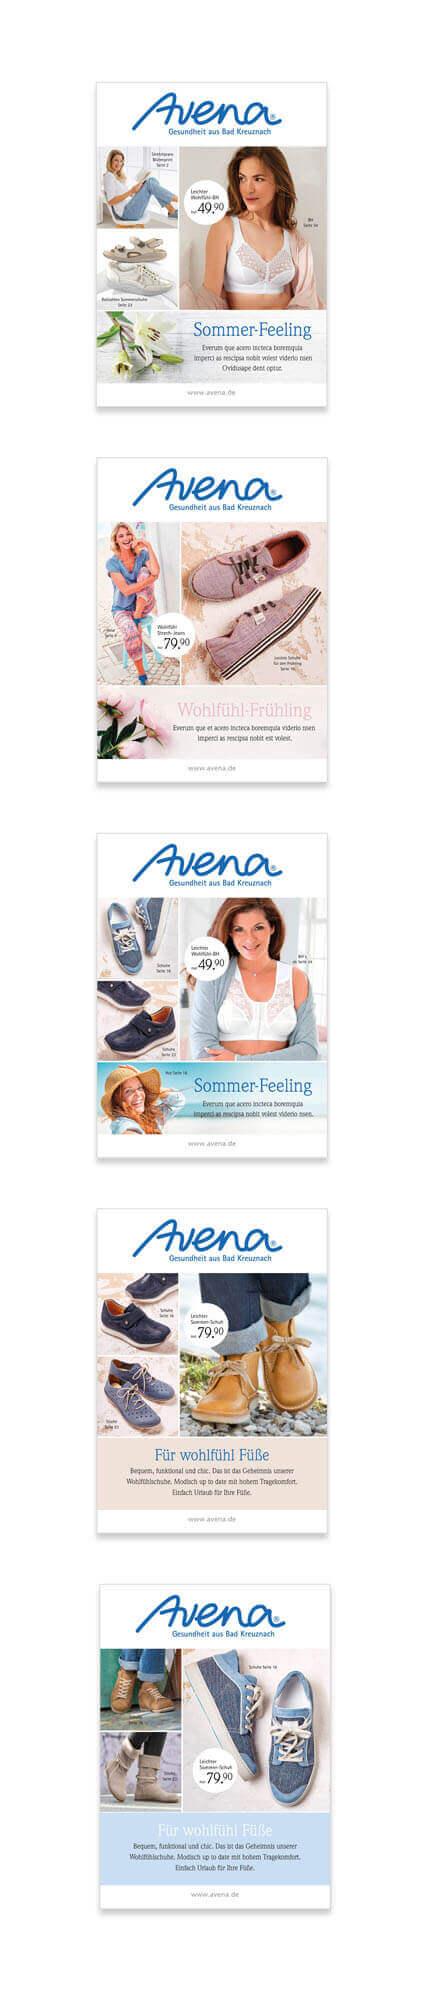 Katalog-Relaunch Neupositionierung Avena-Versand Titelvarianten